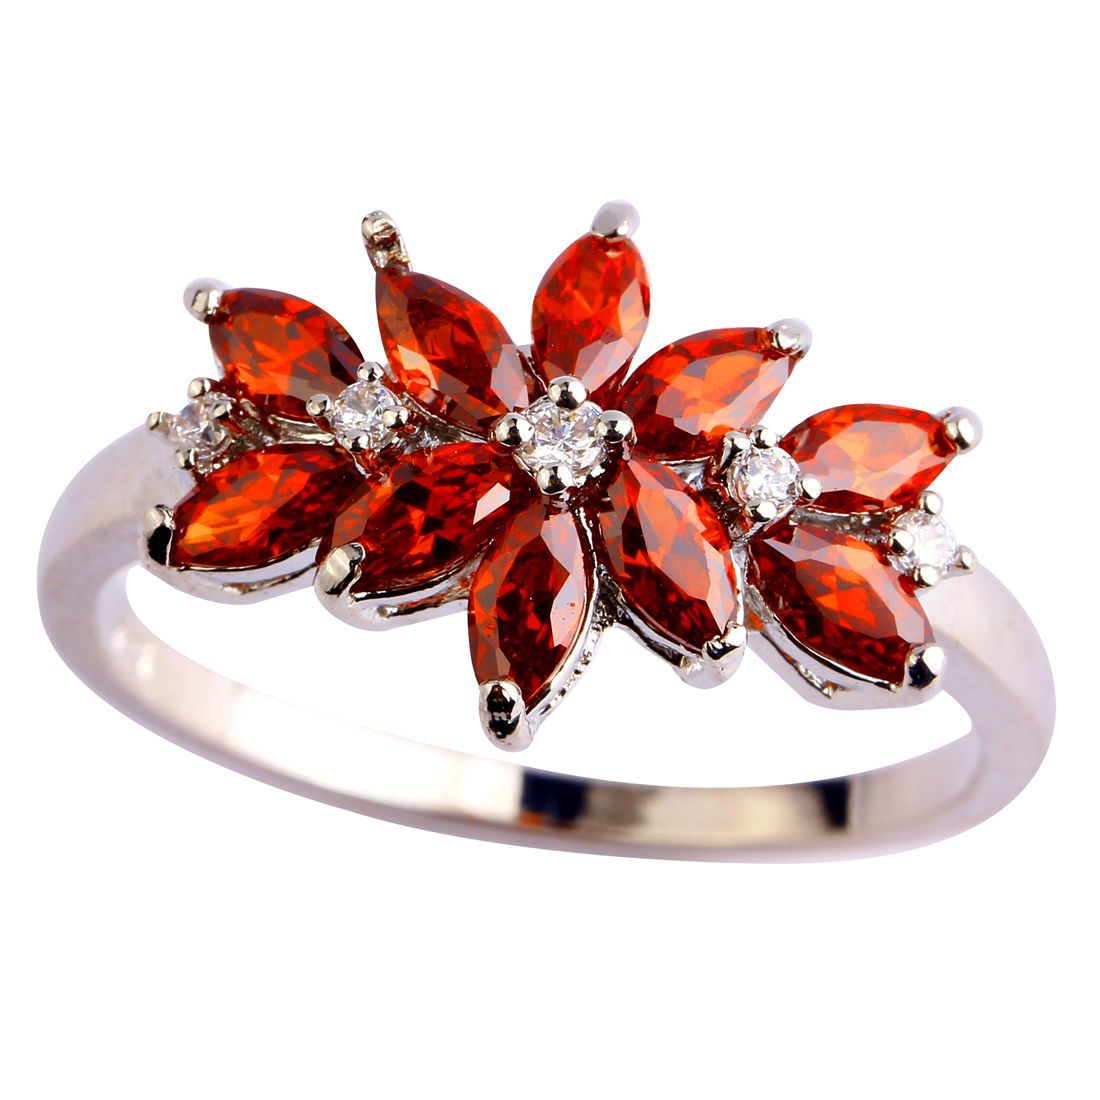 Estate Sapphire Quartz & White Topaz Gemstones Silver Ring Size 7 8 9 10